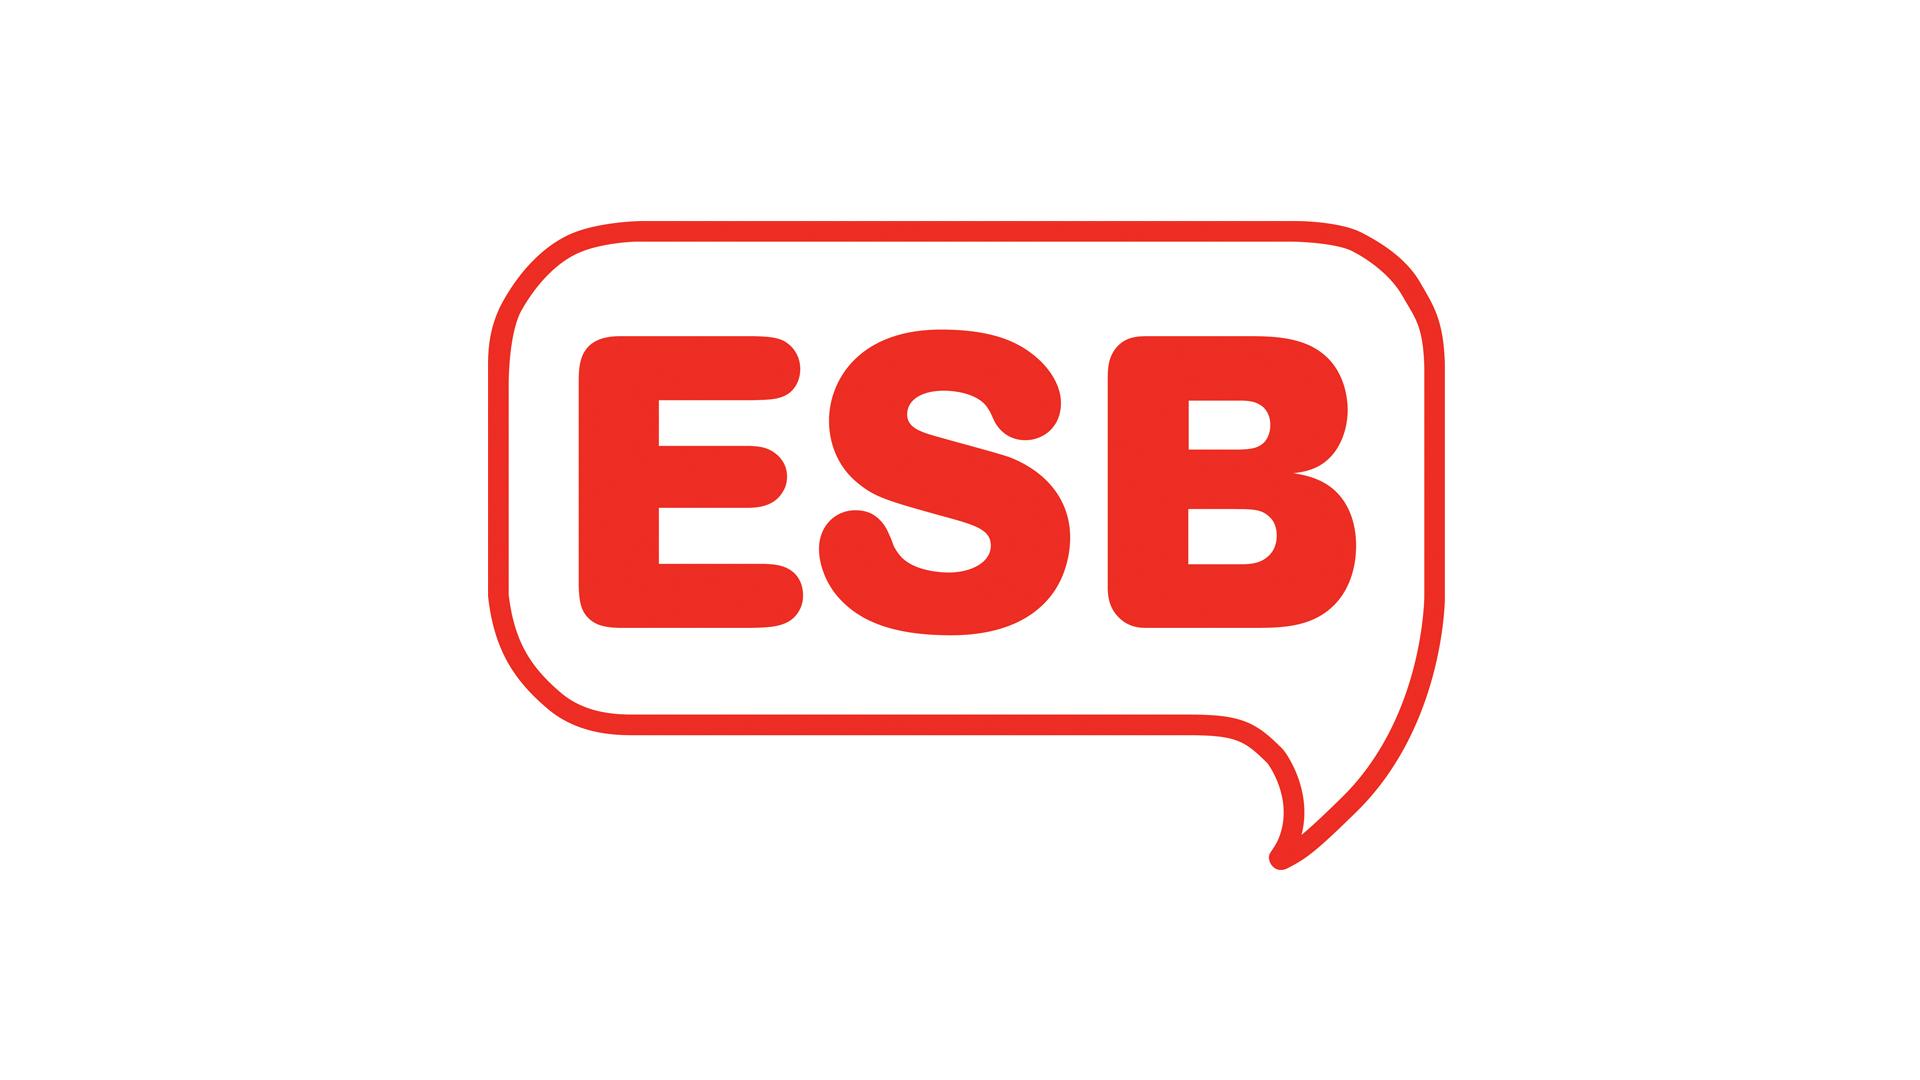 ESB-English-Speaking-Board-Brand-Identity-Logo